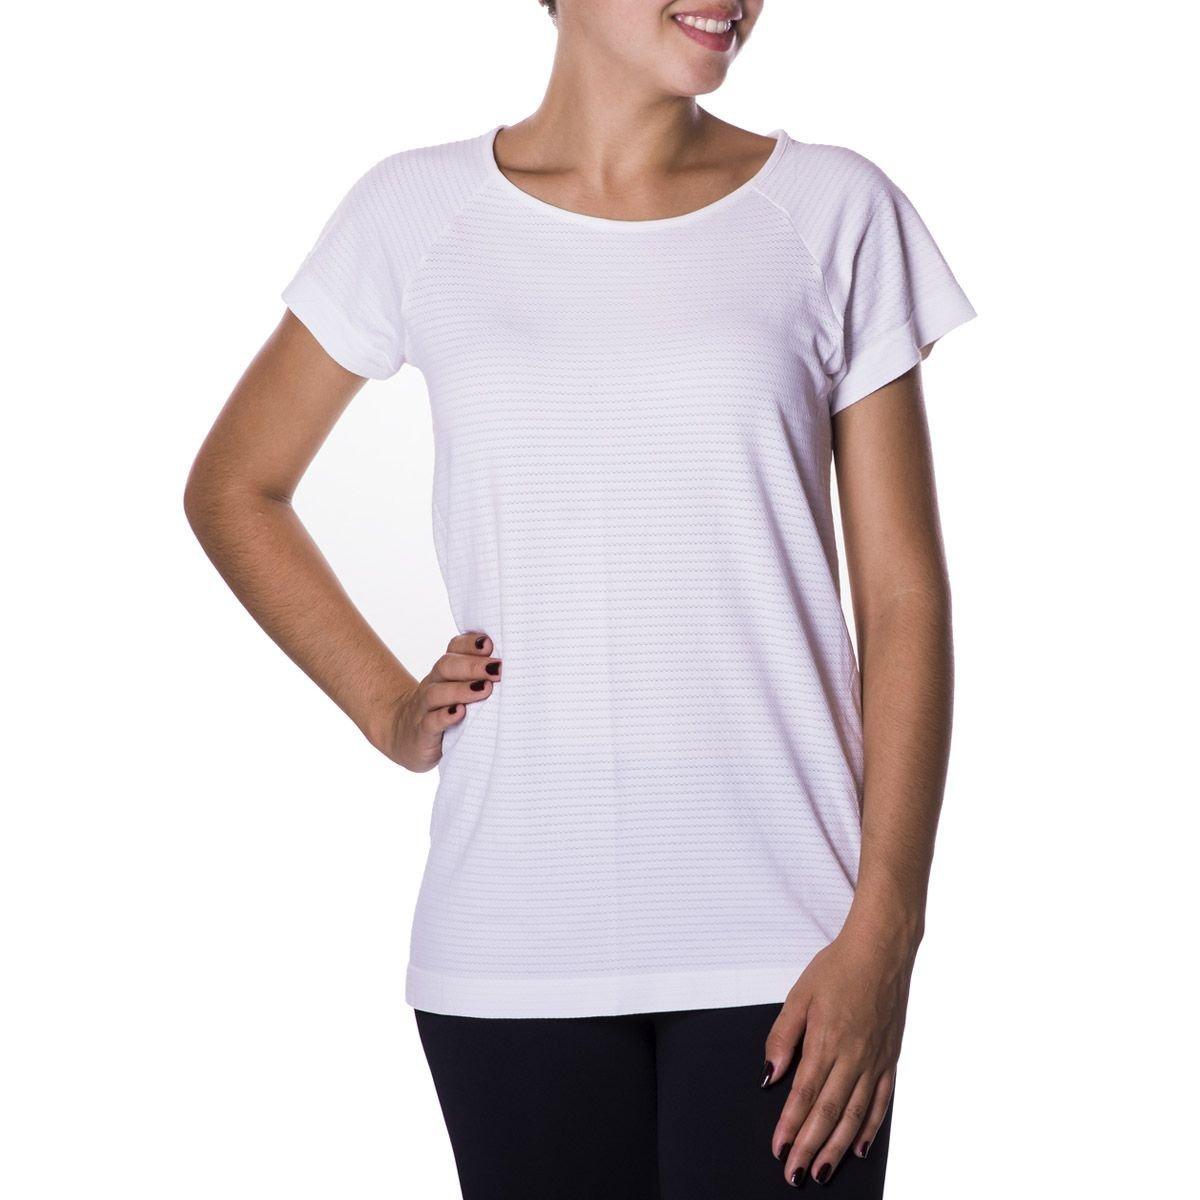 a10398b7d5ed Camiseta Feminina De Esportes Fitness Lupo Sport